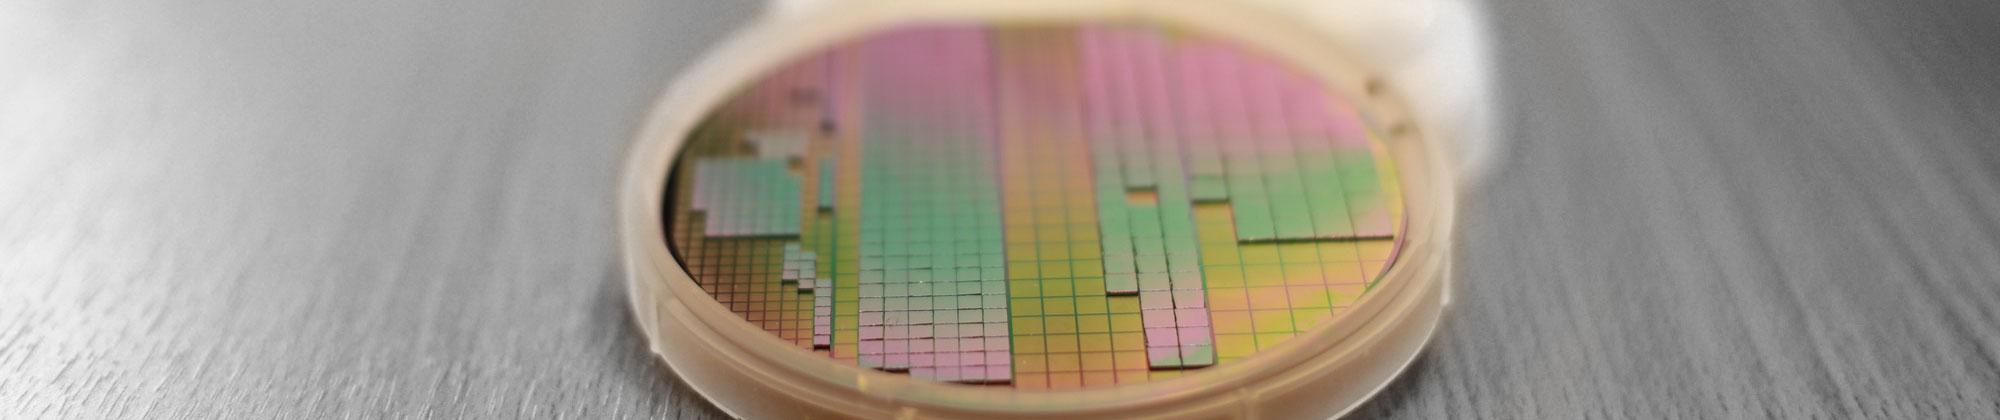 Making More of Moore's Law | UCLA Samueli School Of Engineering